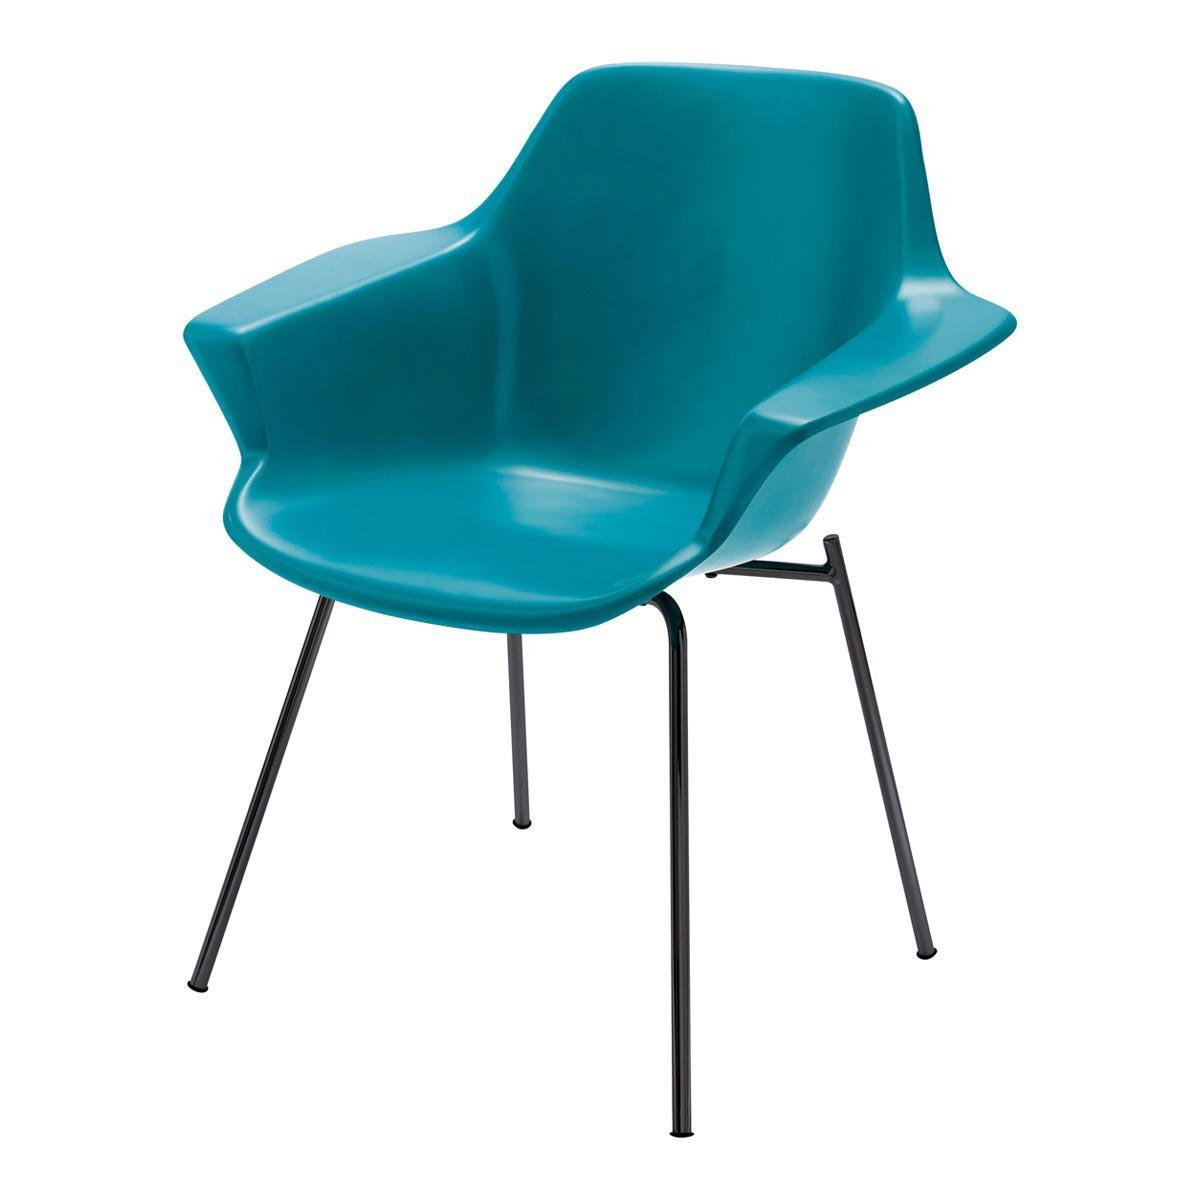 vintage r dition ou chin cocon d co vie nomade. Black Bedroom Furniture Sets. Home Design Ideas